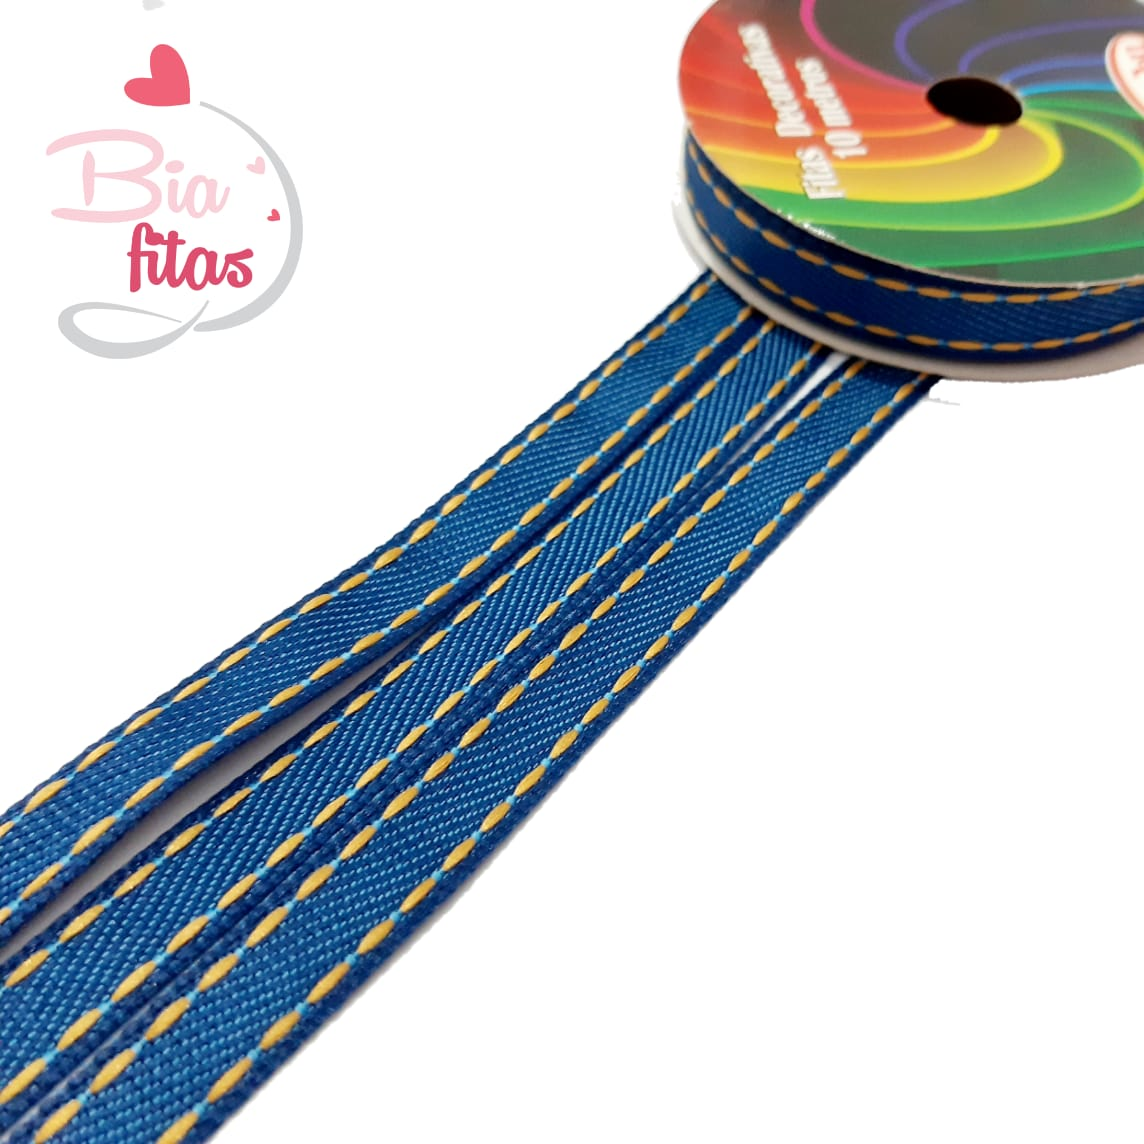 Fita de Jeans Pesponto Sinimbú 10- 01 - 10 metros